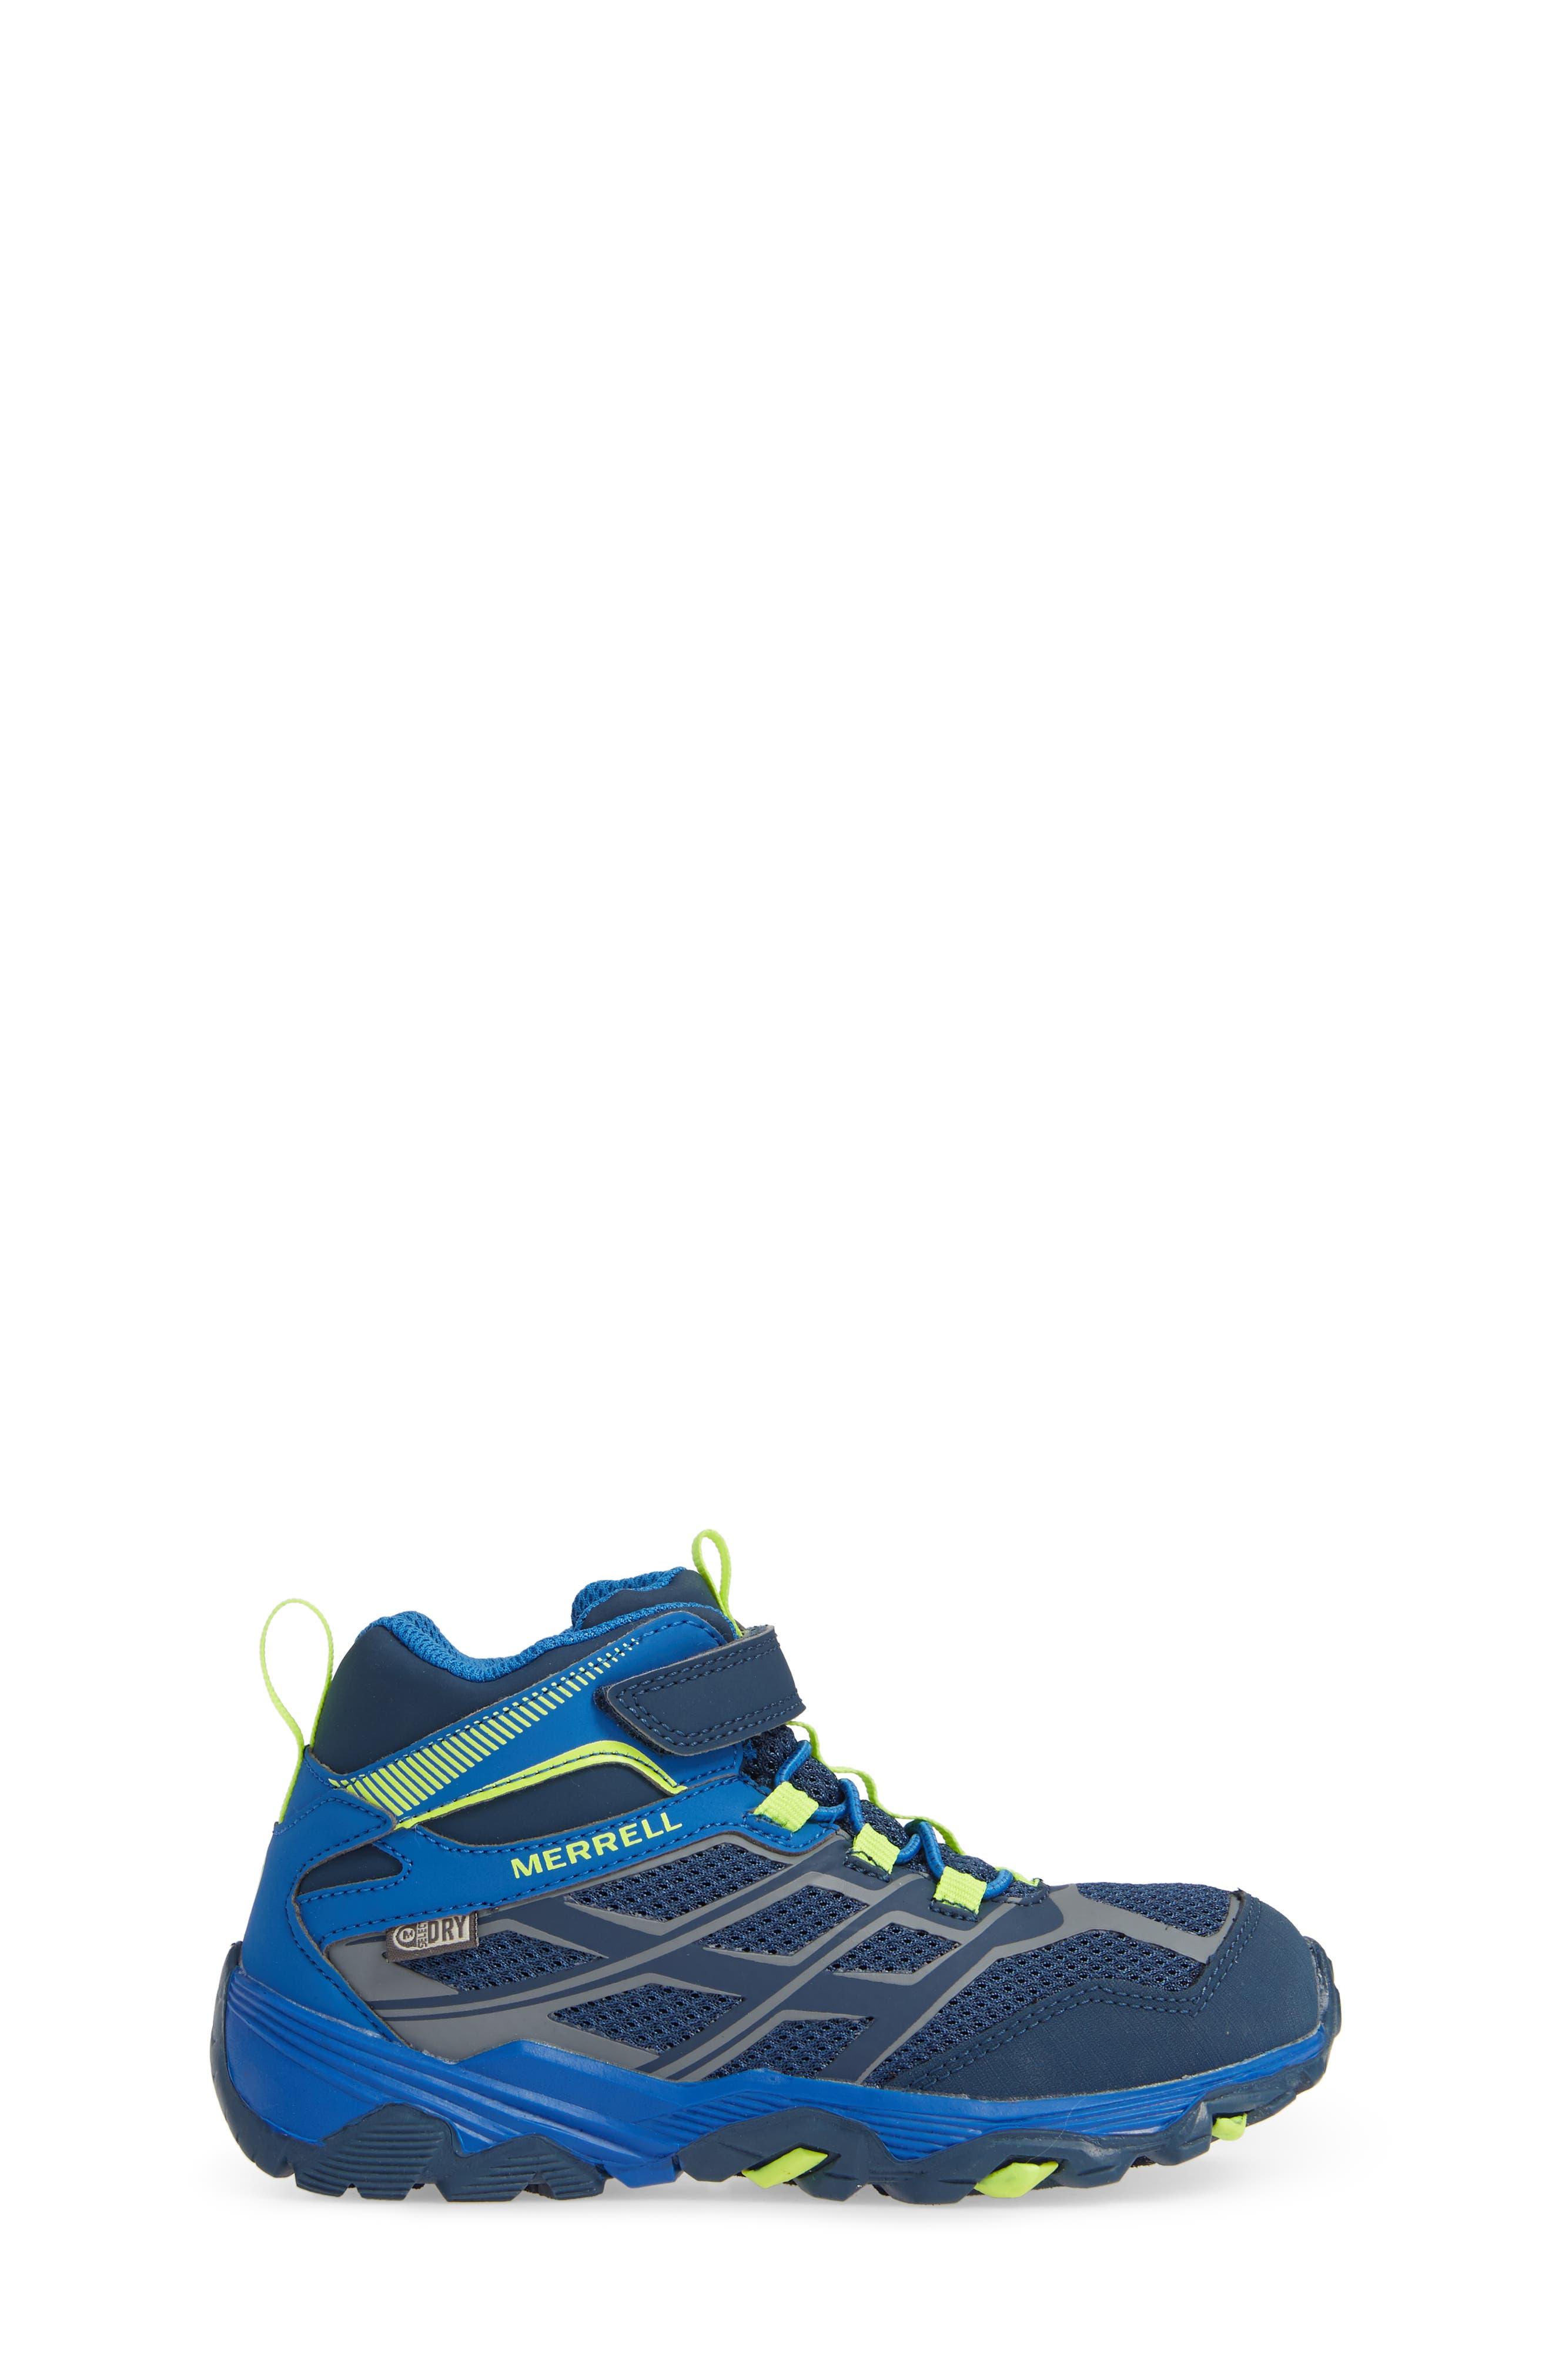 MERRELL, Moab FST Mid Top Waterproof Sneaker Boot, Alternate thumbnail 3, color, NAVY/ COBALT